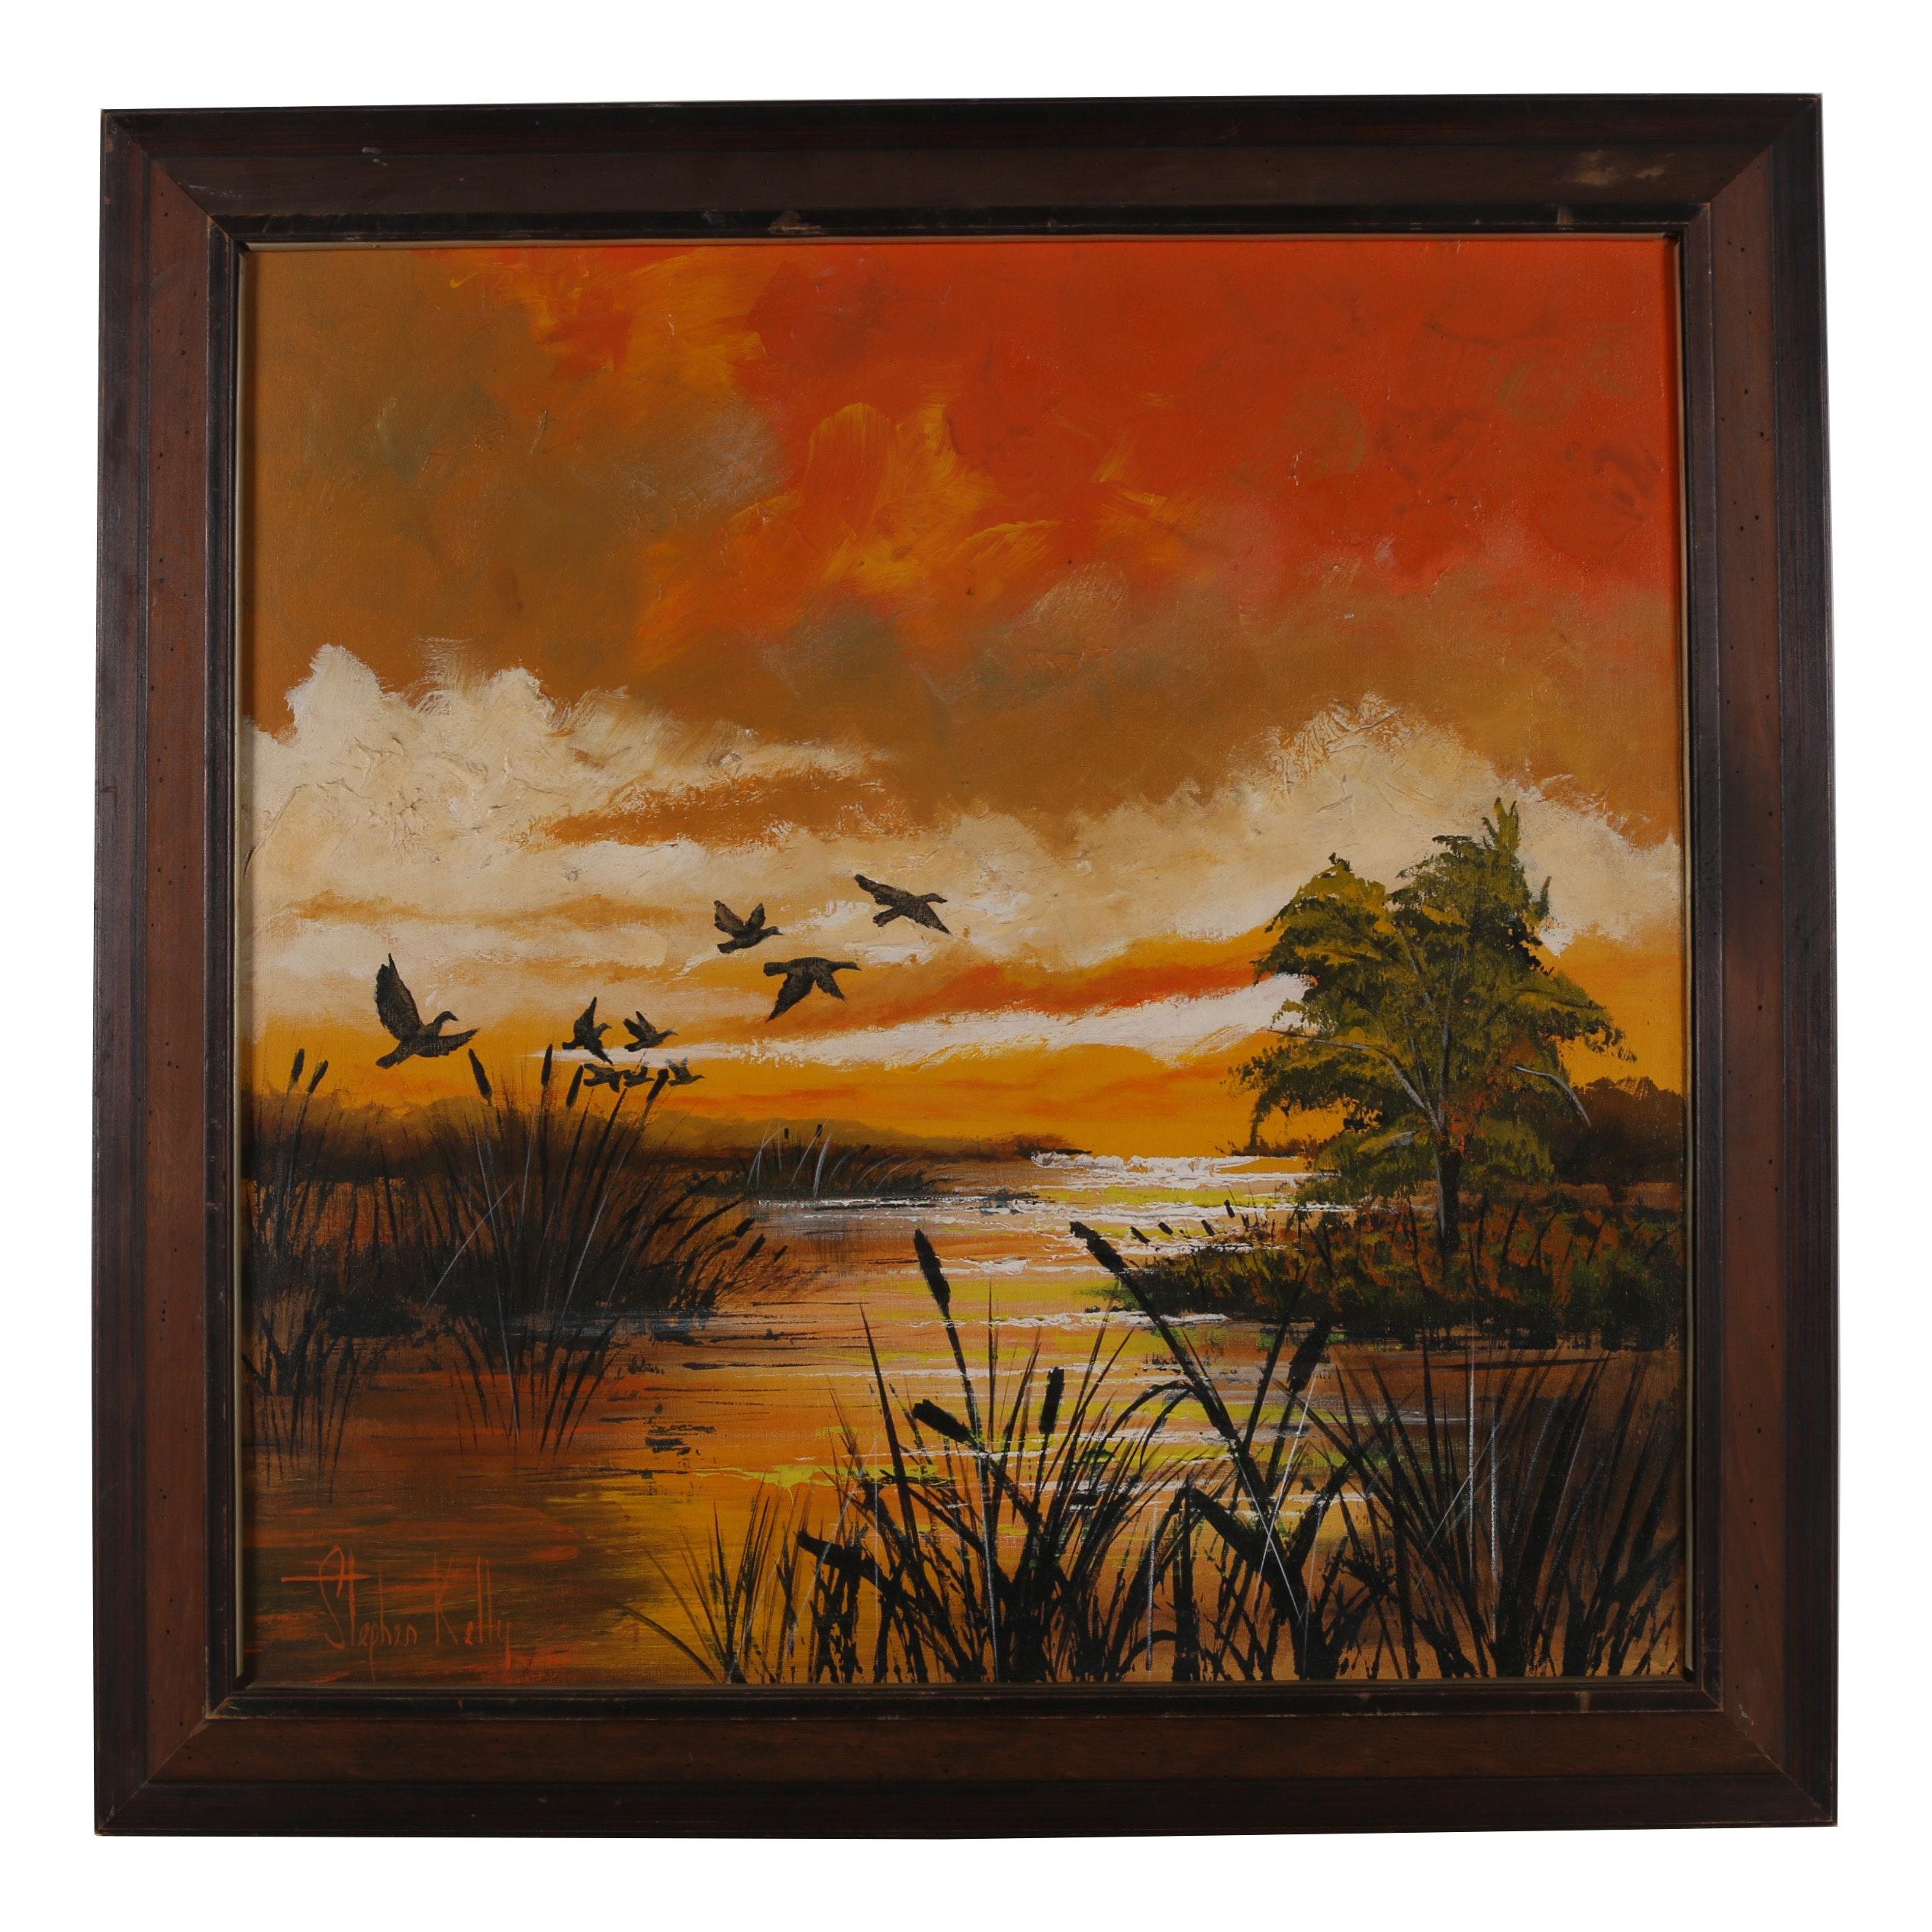 Stephen Kelly Acrylic Painting